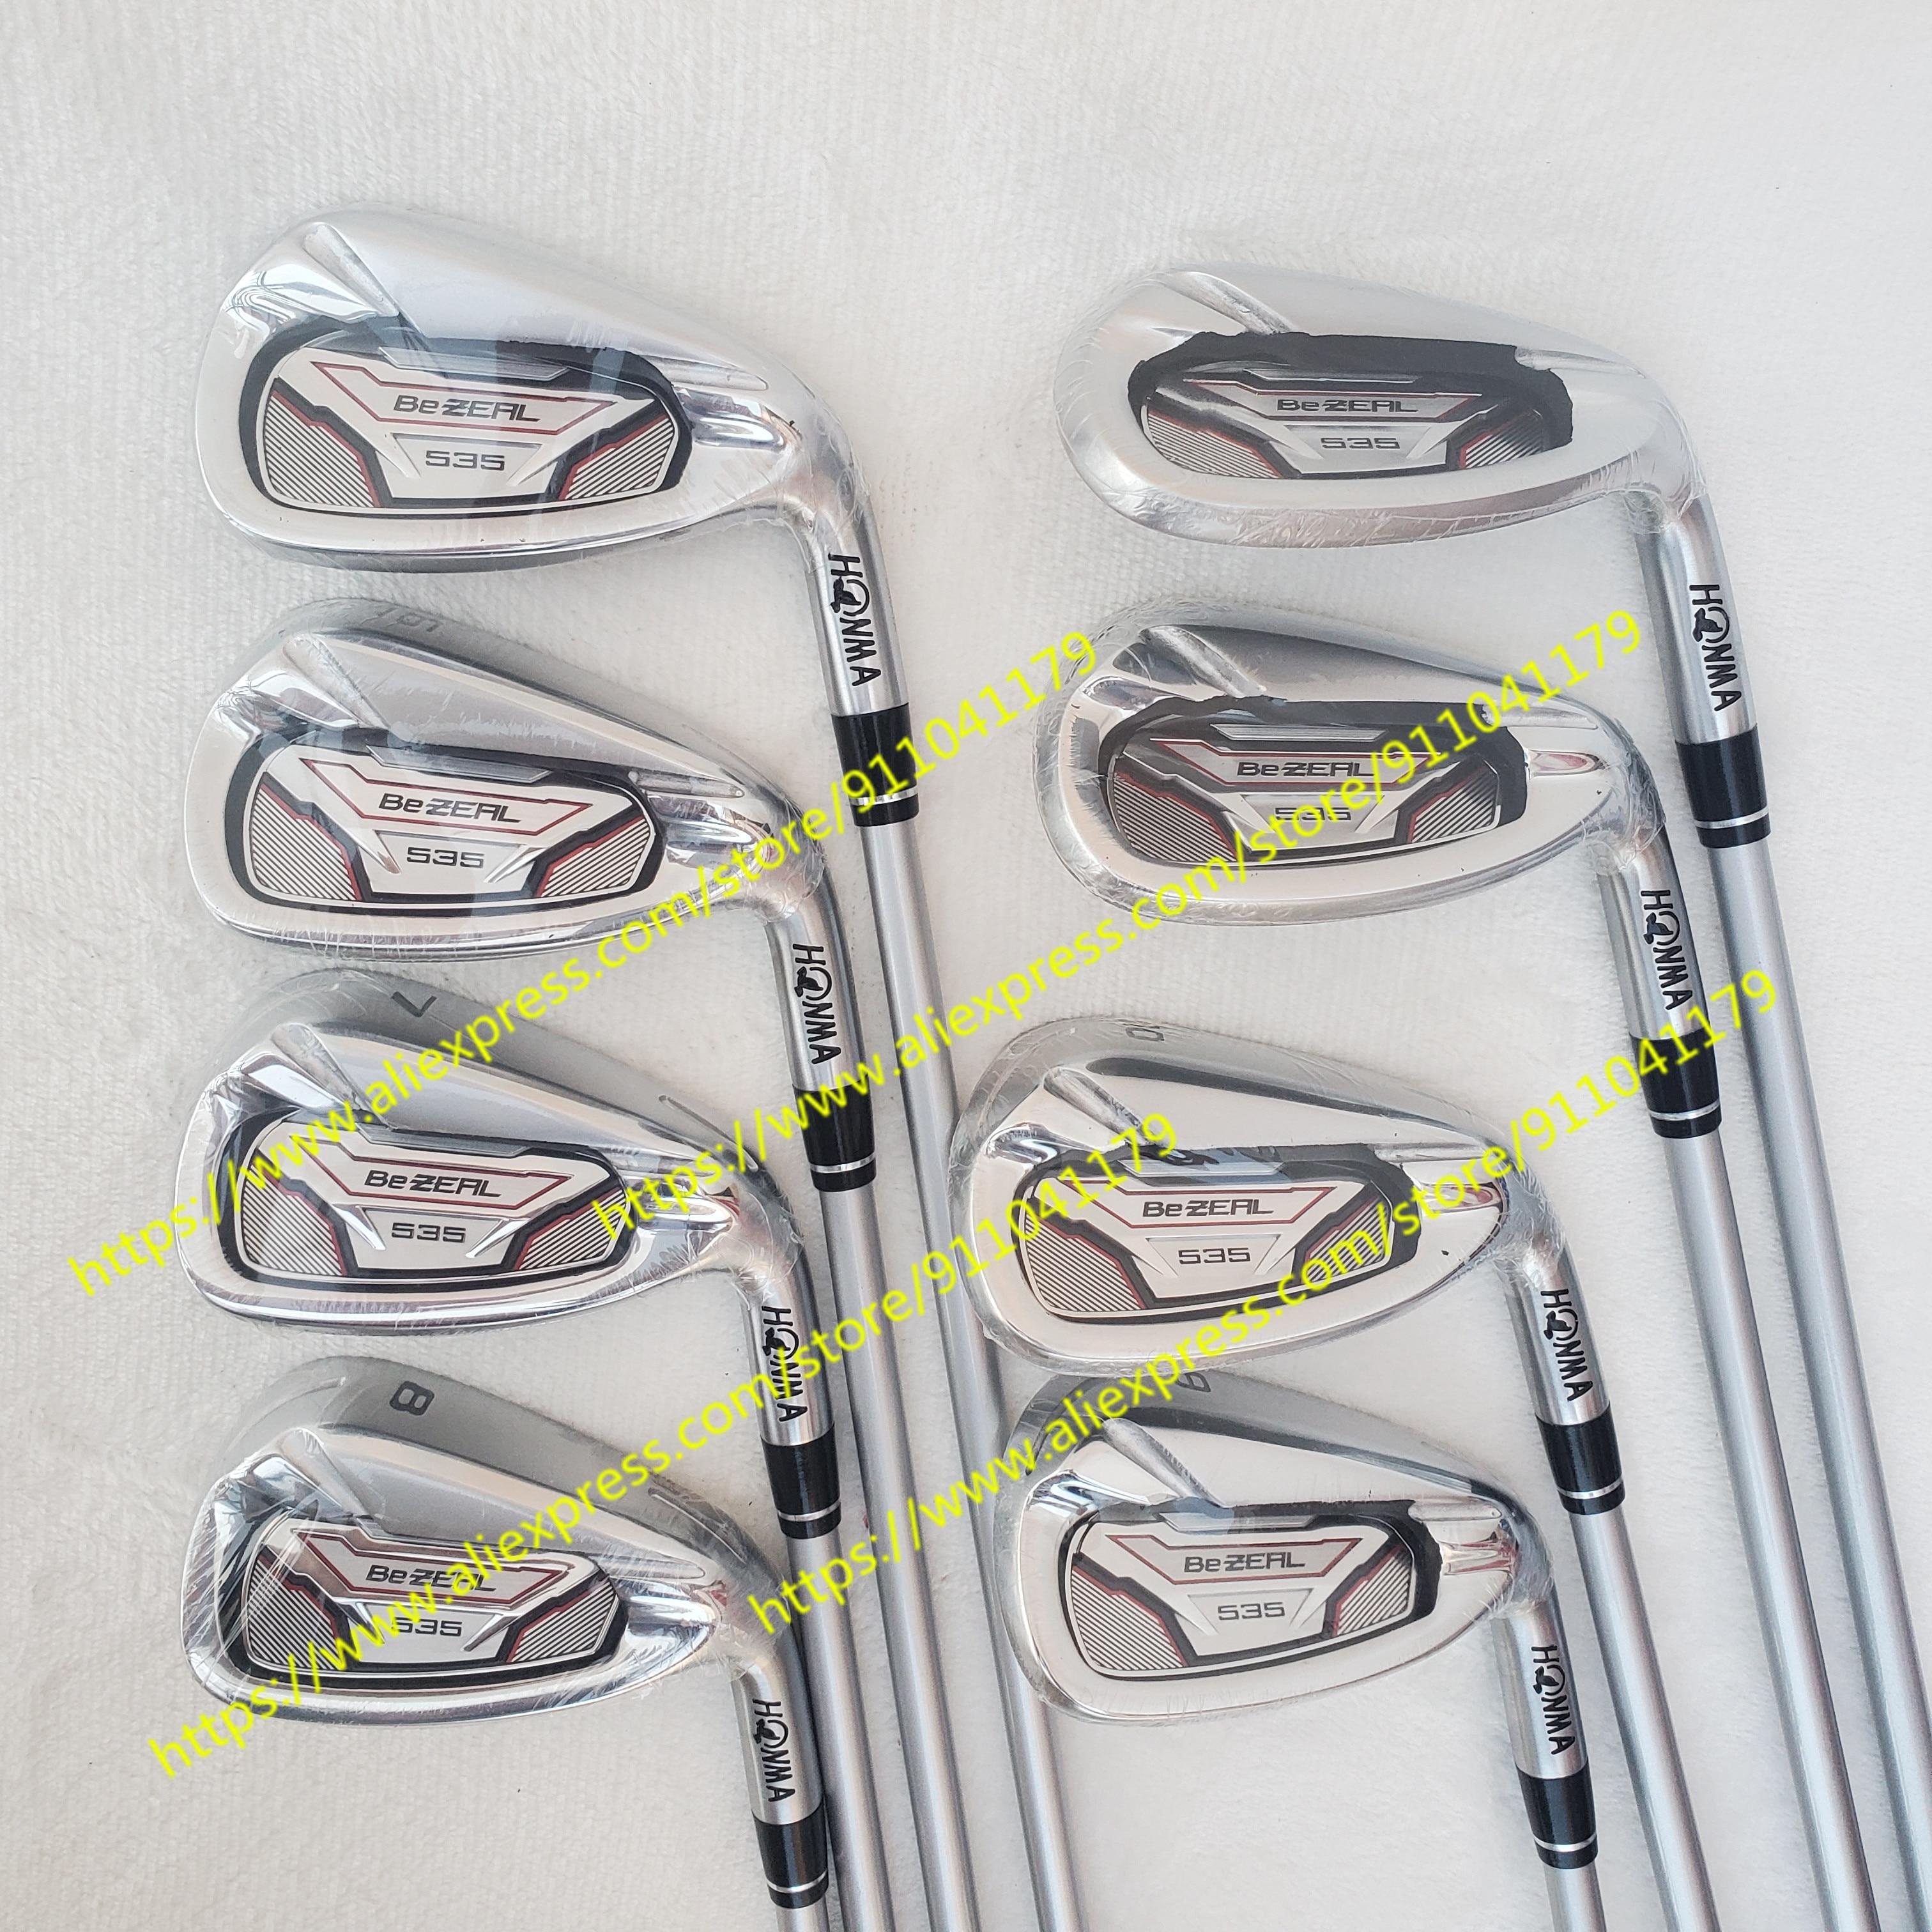 2021 Men Golf irons HONMA BEZEAL 535 Golf irons(Titanium strike surface)HONMA Golf Club